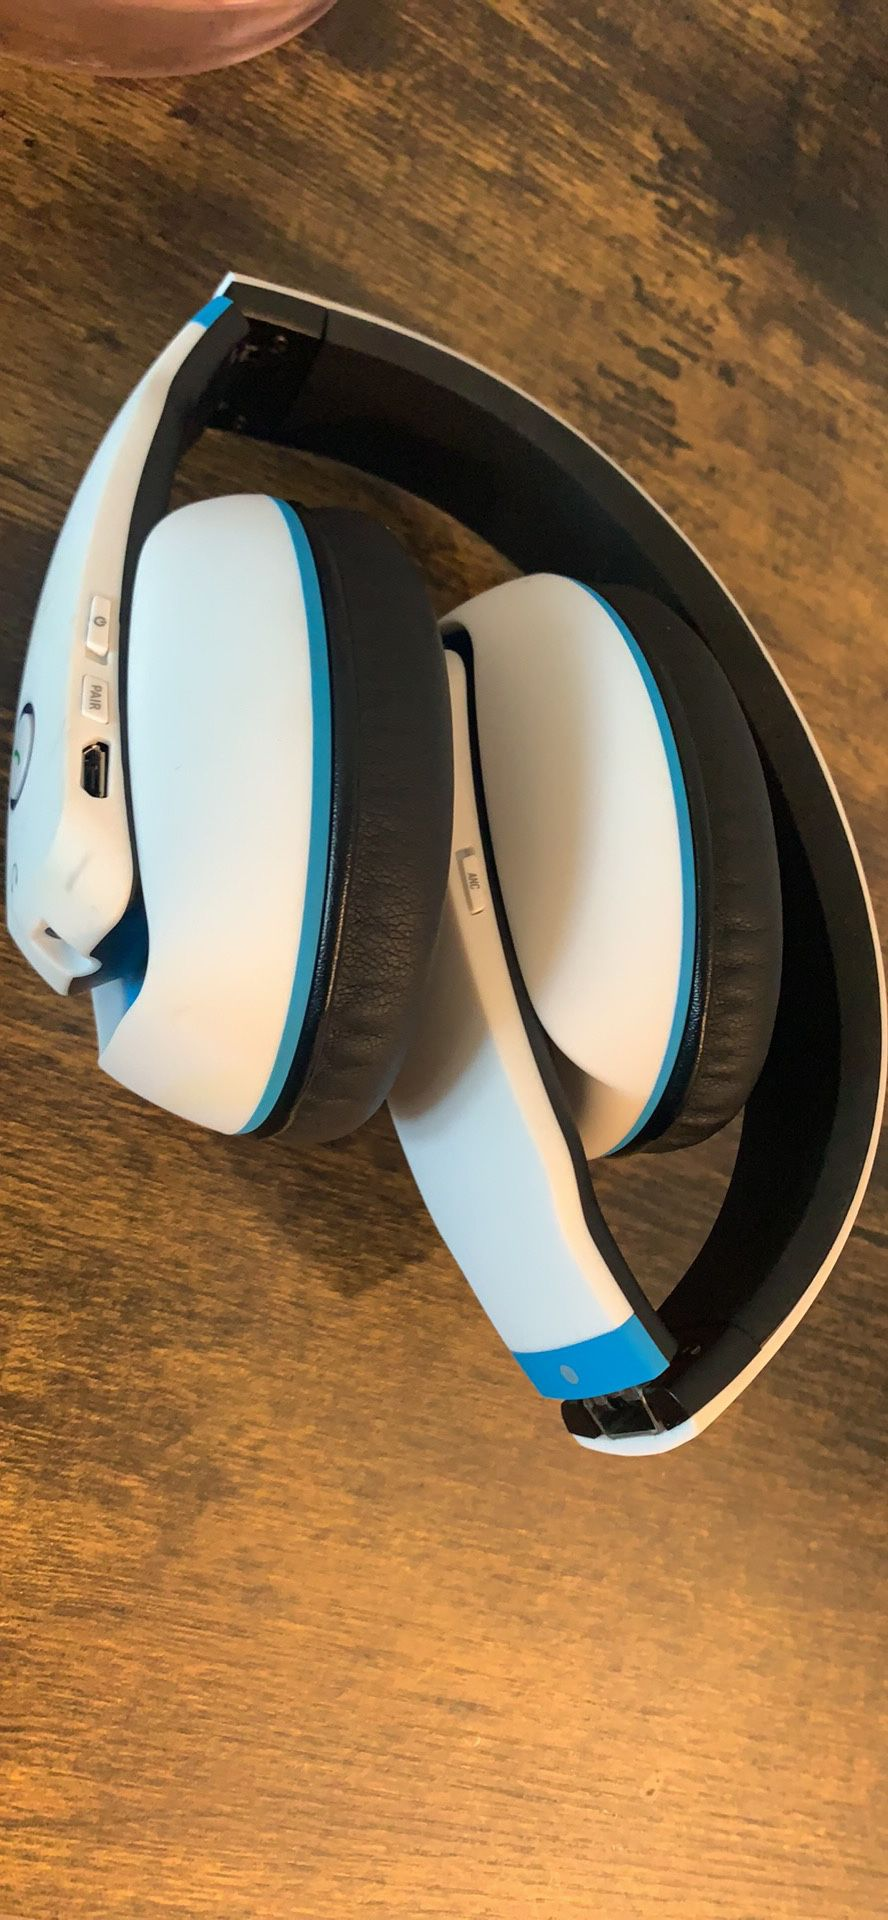 Foldable Wireless Noise cancellation NFC technology Headphones